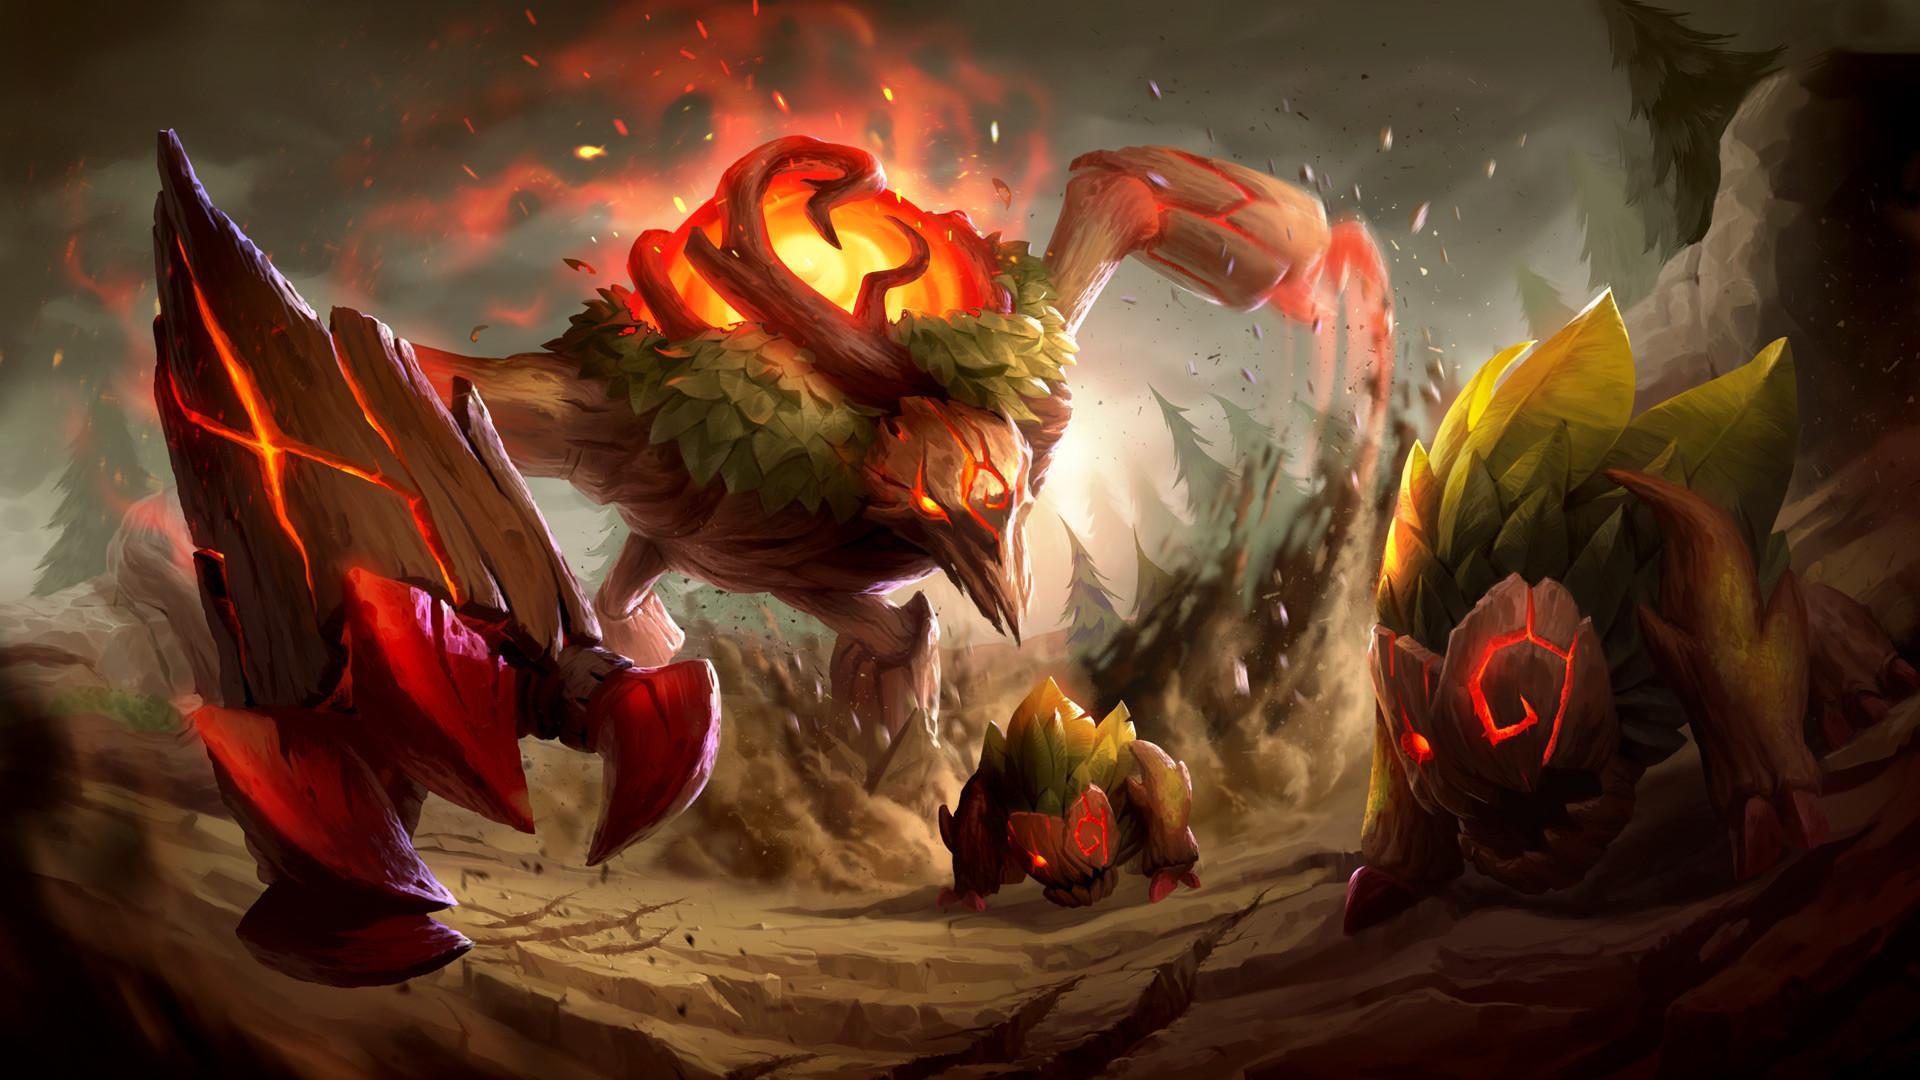 Giselle Almeida League Of Legends Red Brambleback By Gisalmeida D9ijx4h